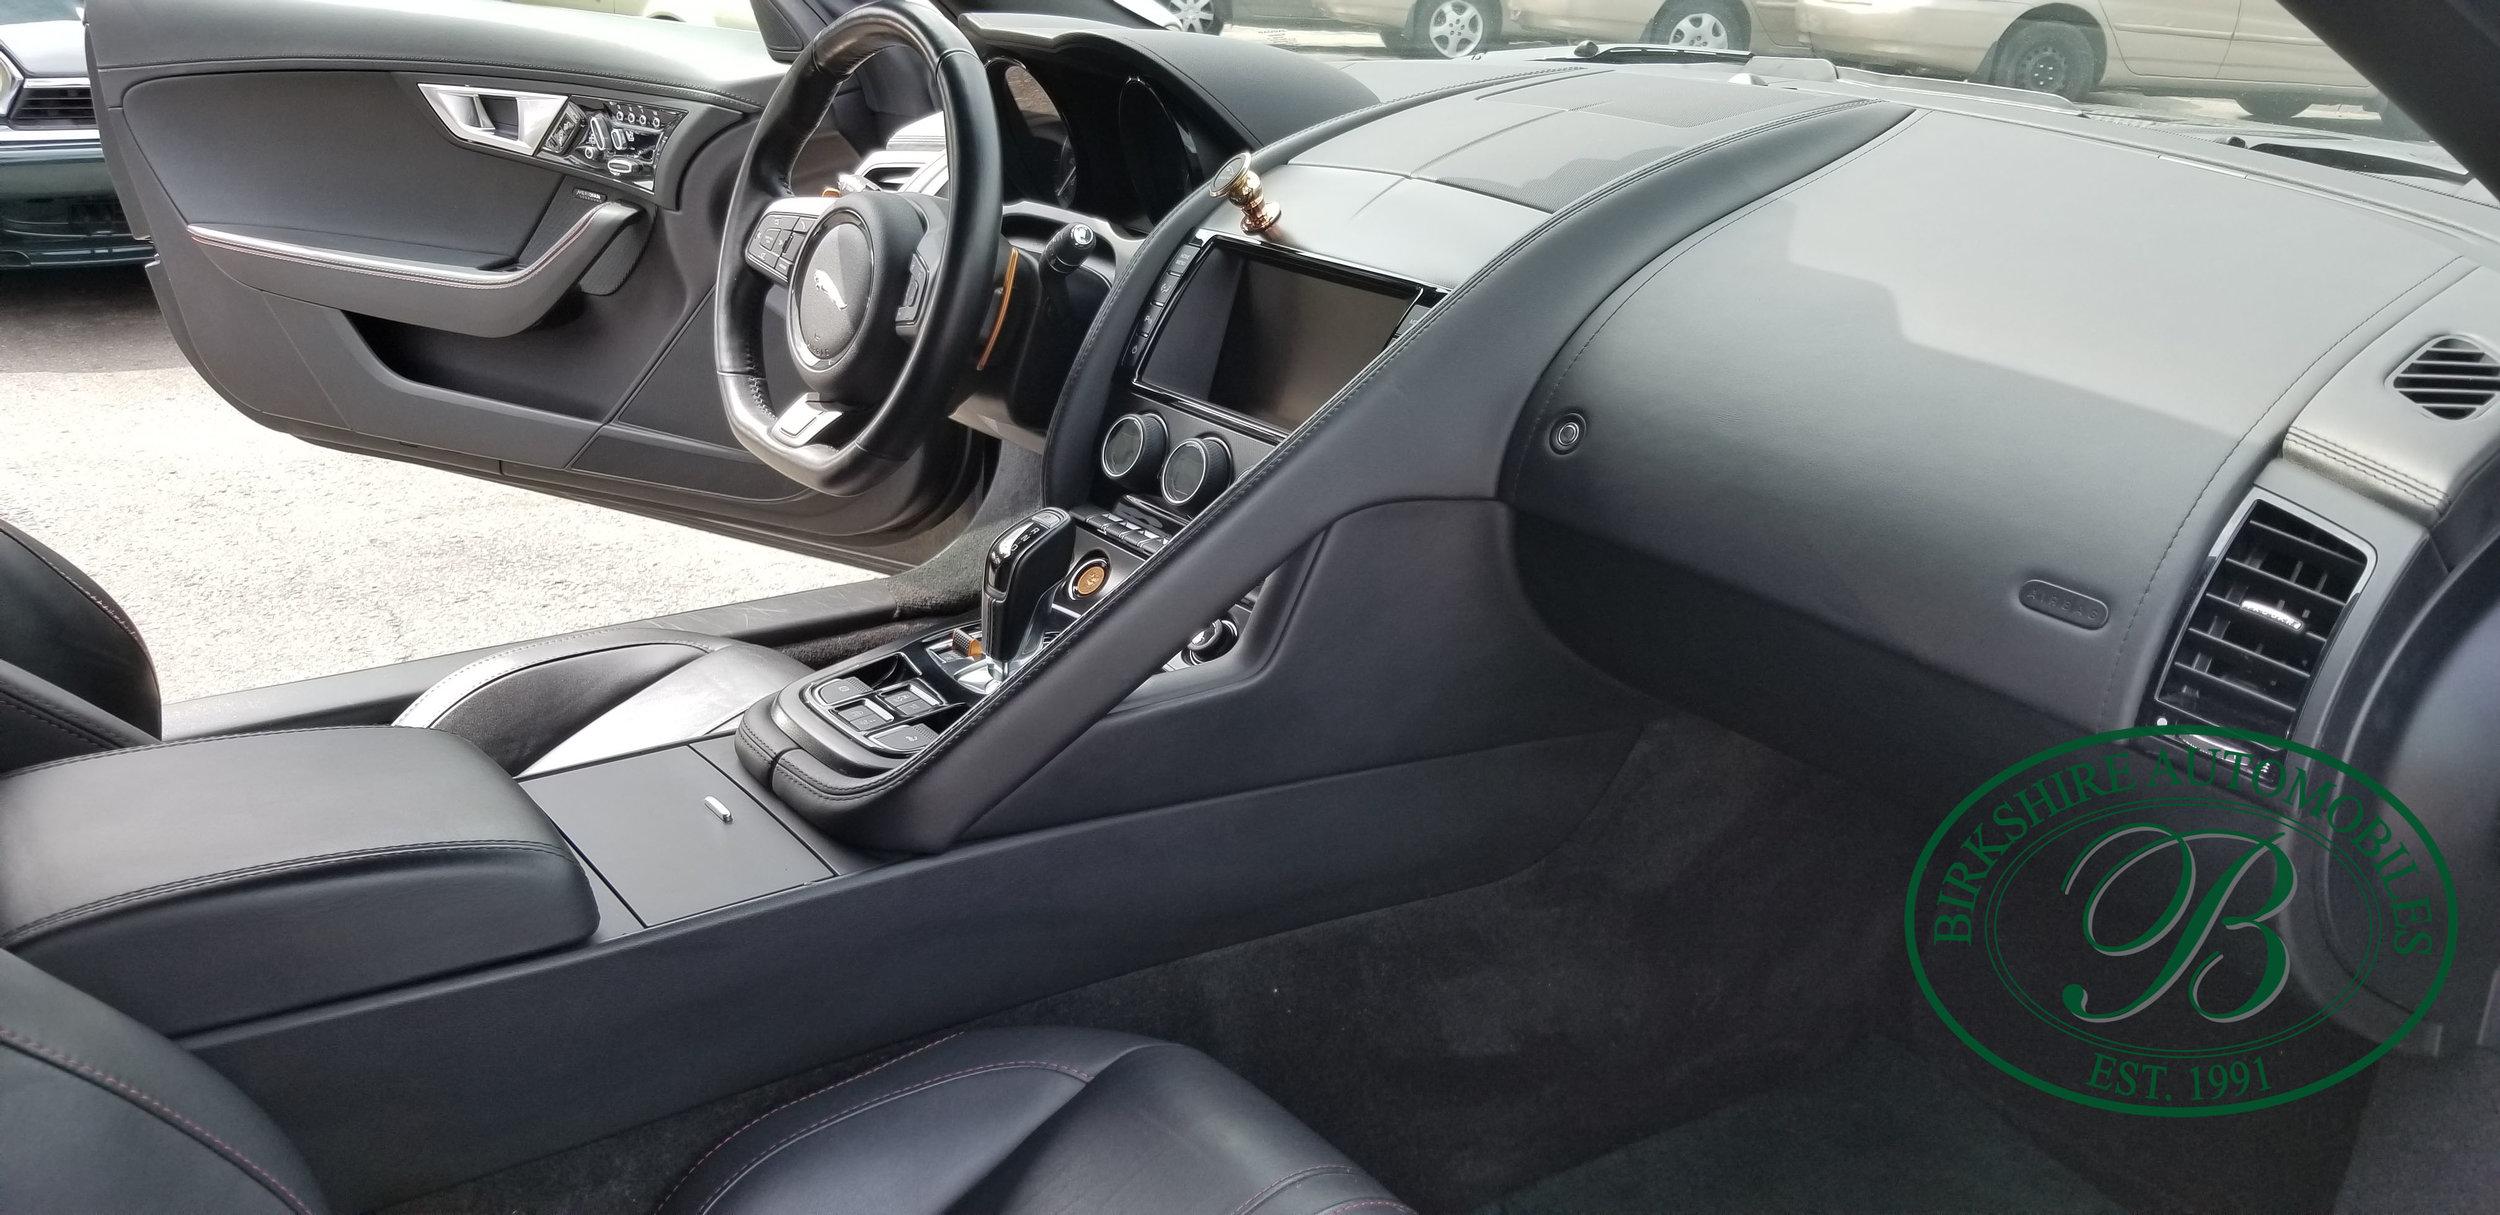 2014 F-Type V8 S - Birkshire Automobiles (65).jpg